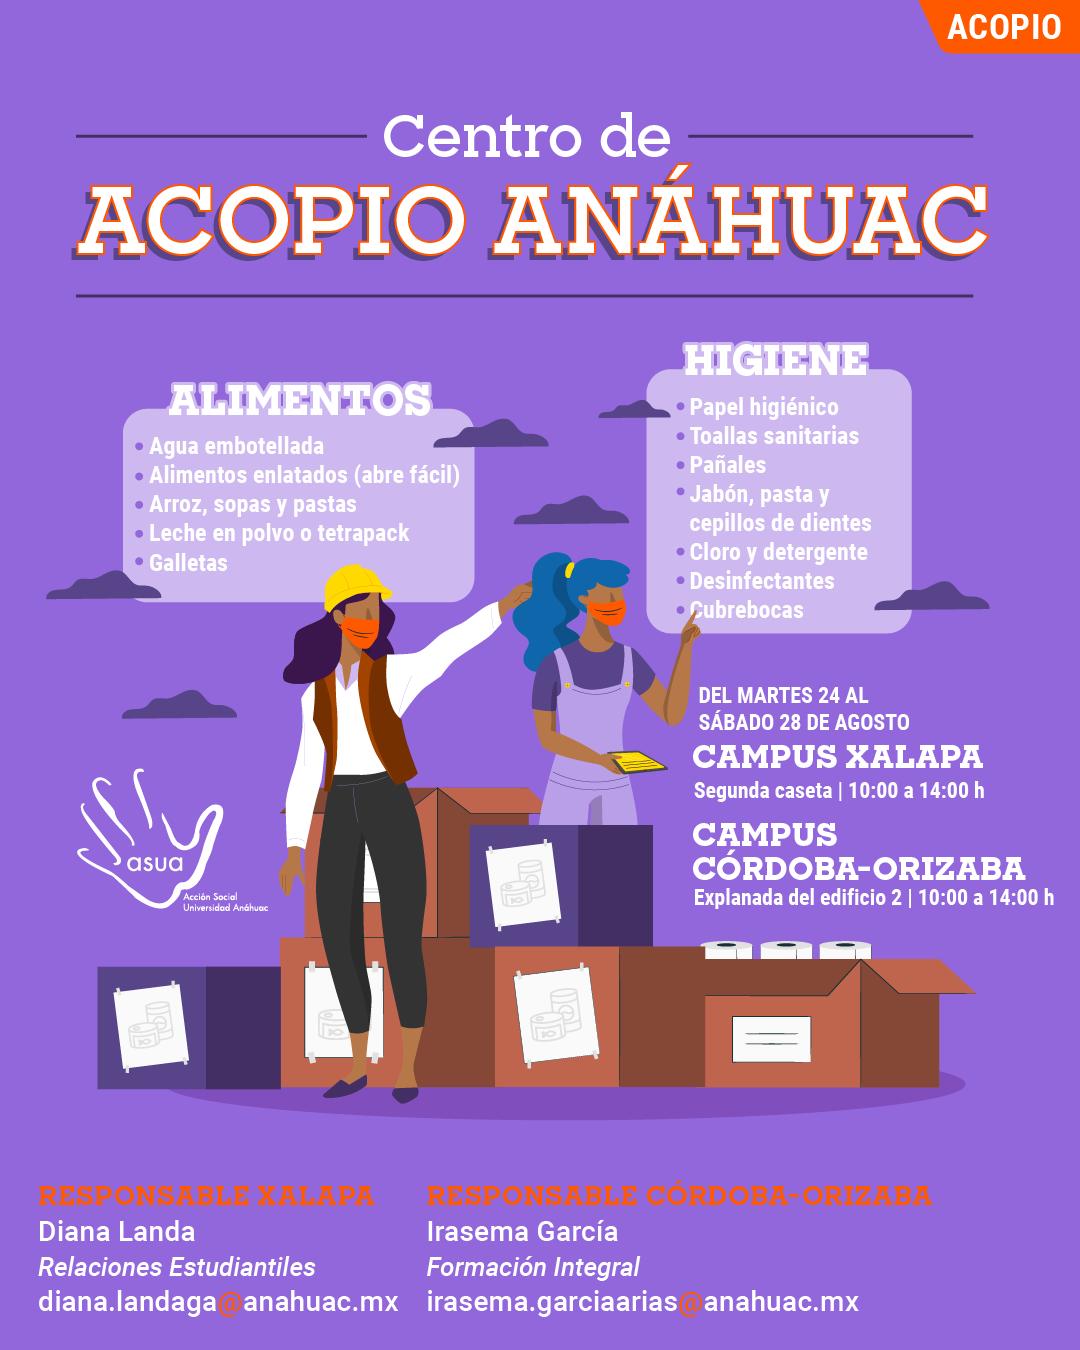 Centro de Acopio Anáhuac